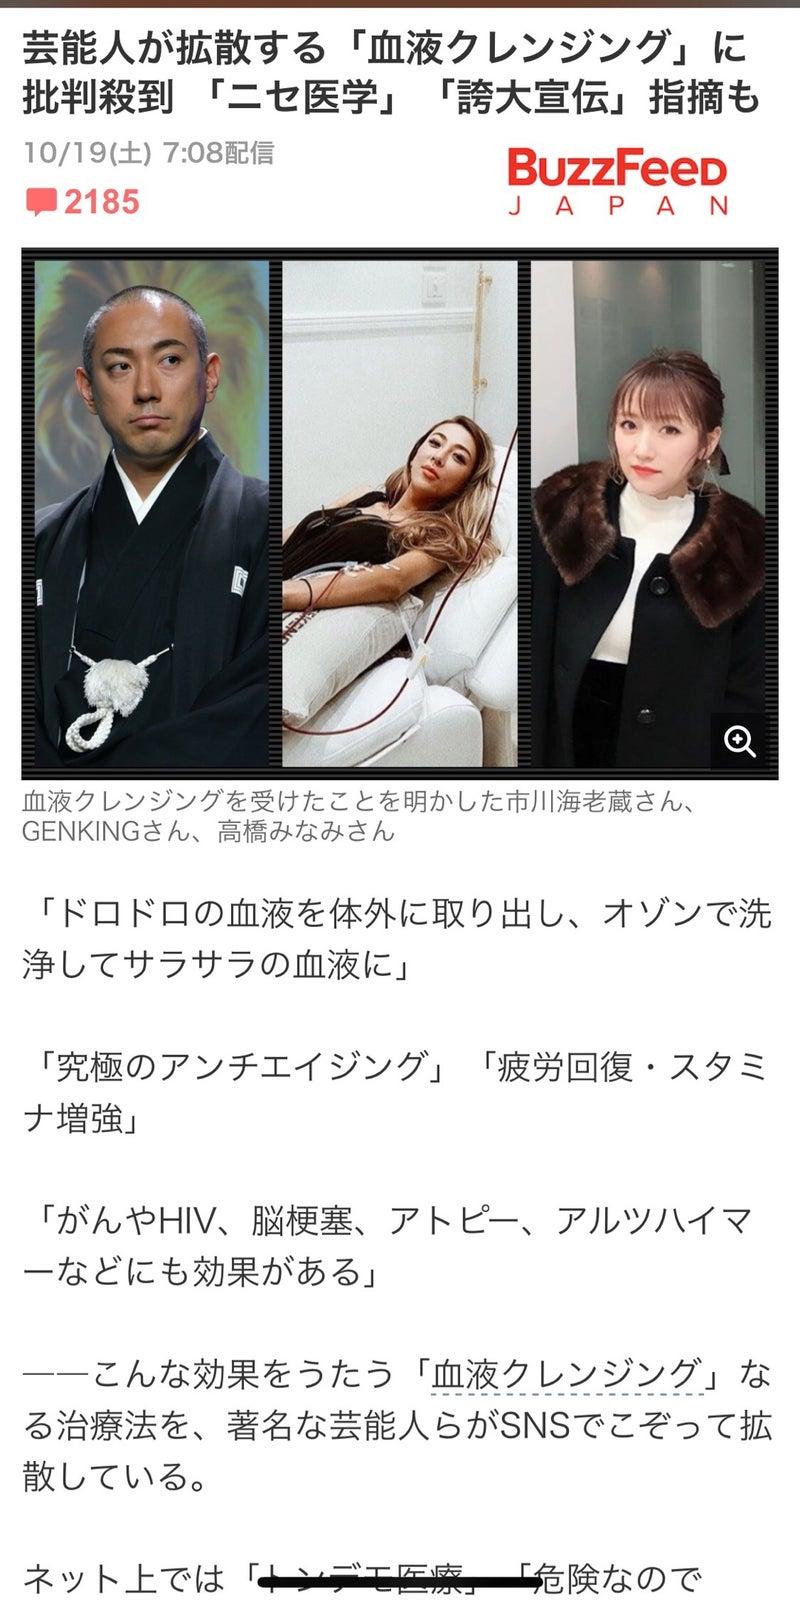 「市川海老蔵 ブログ 血液」の画像検索結果